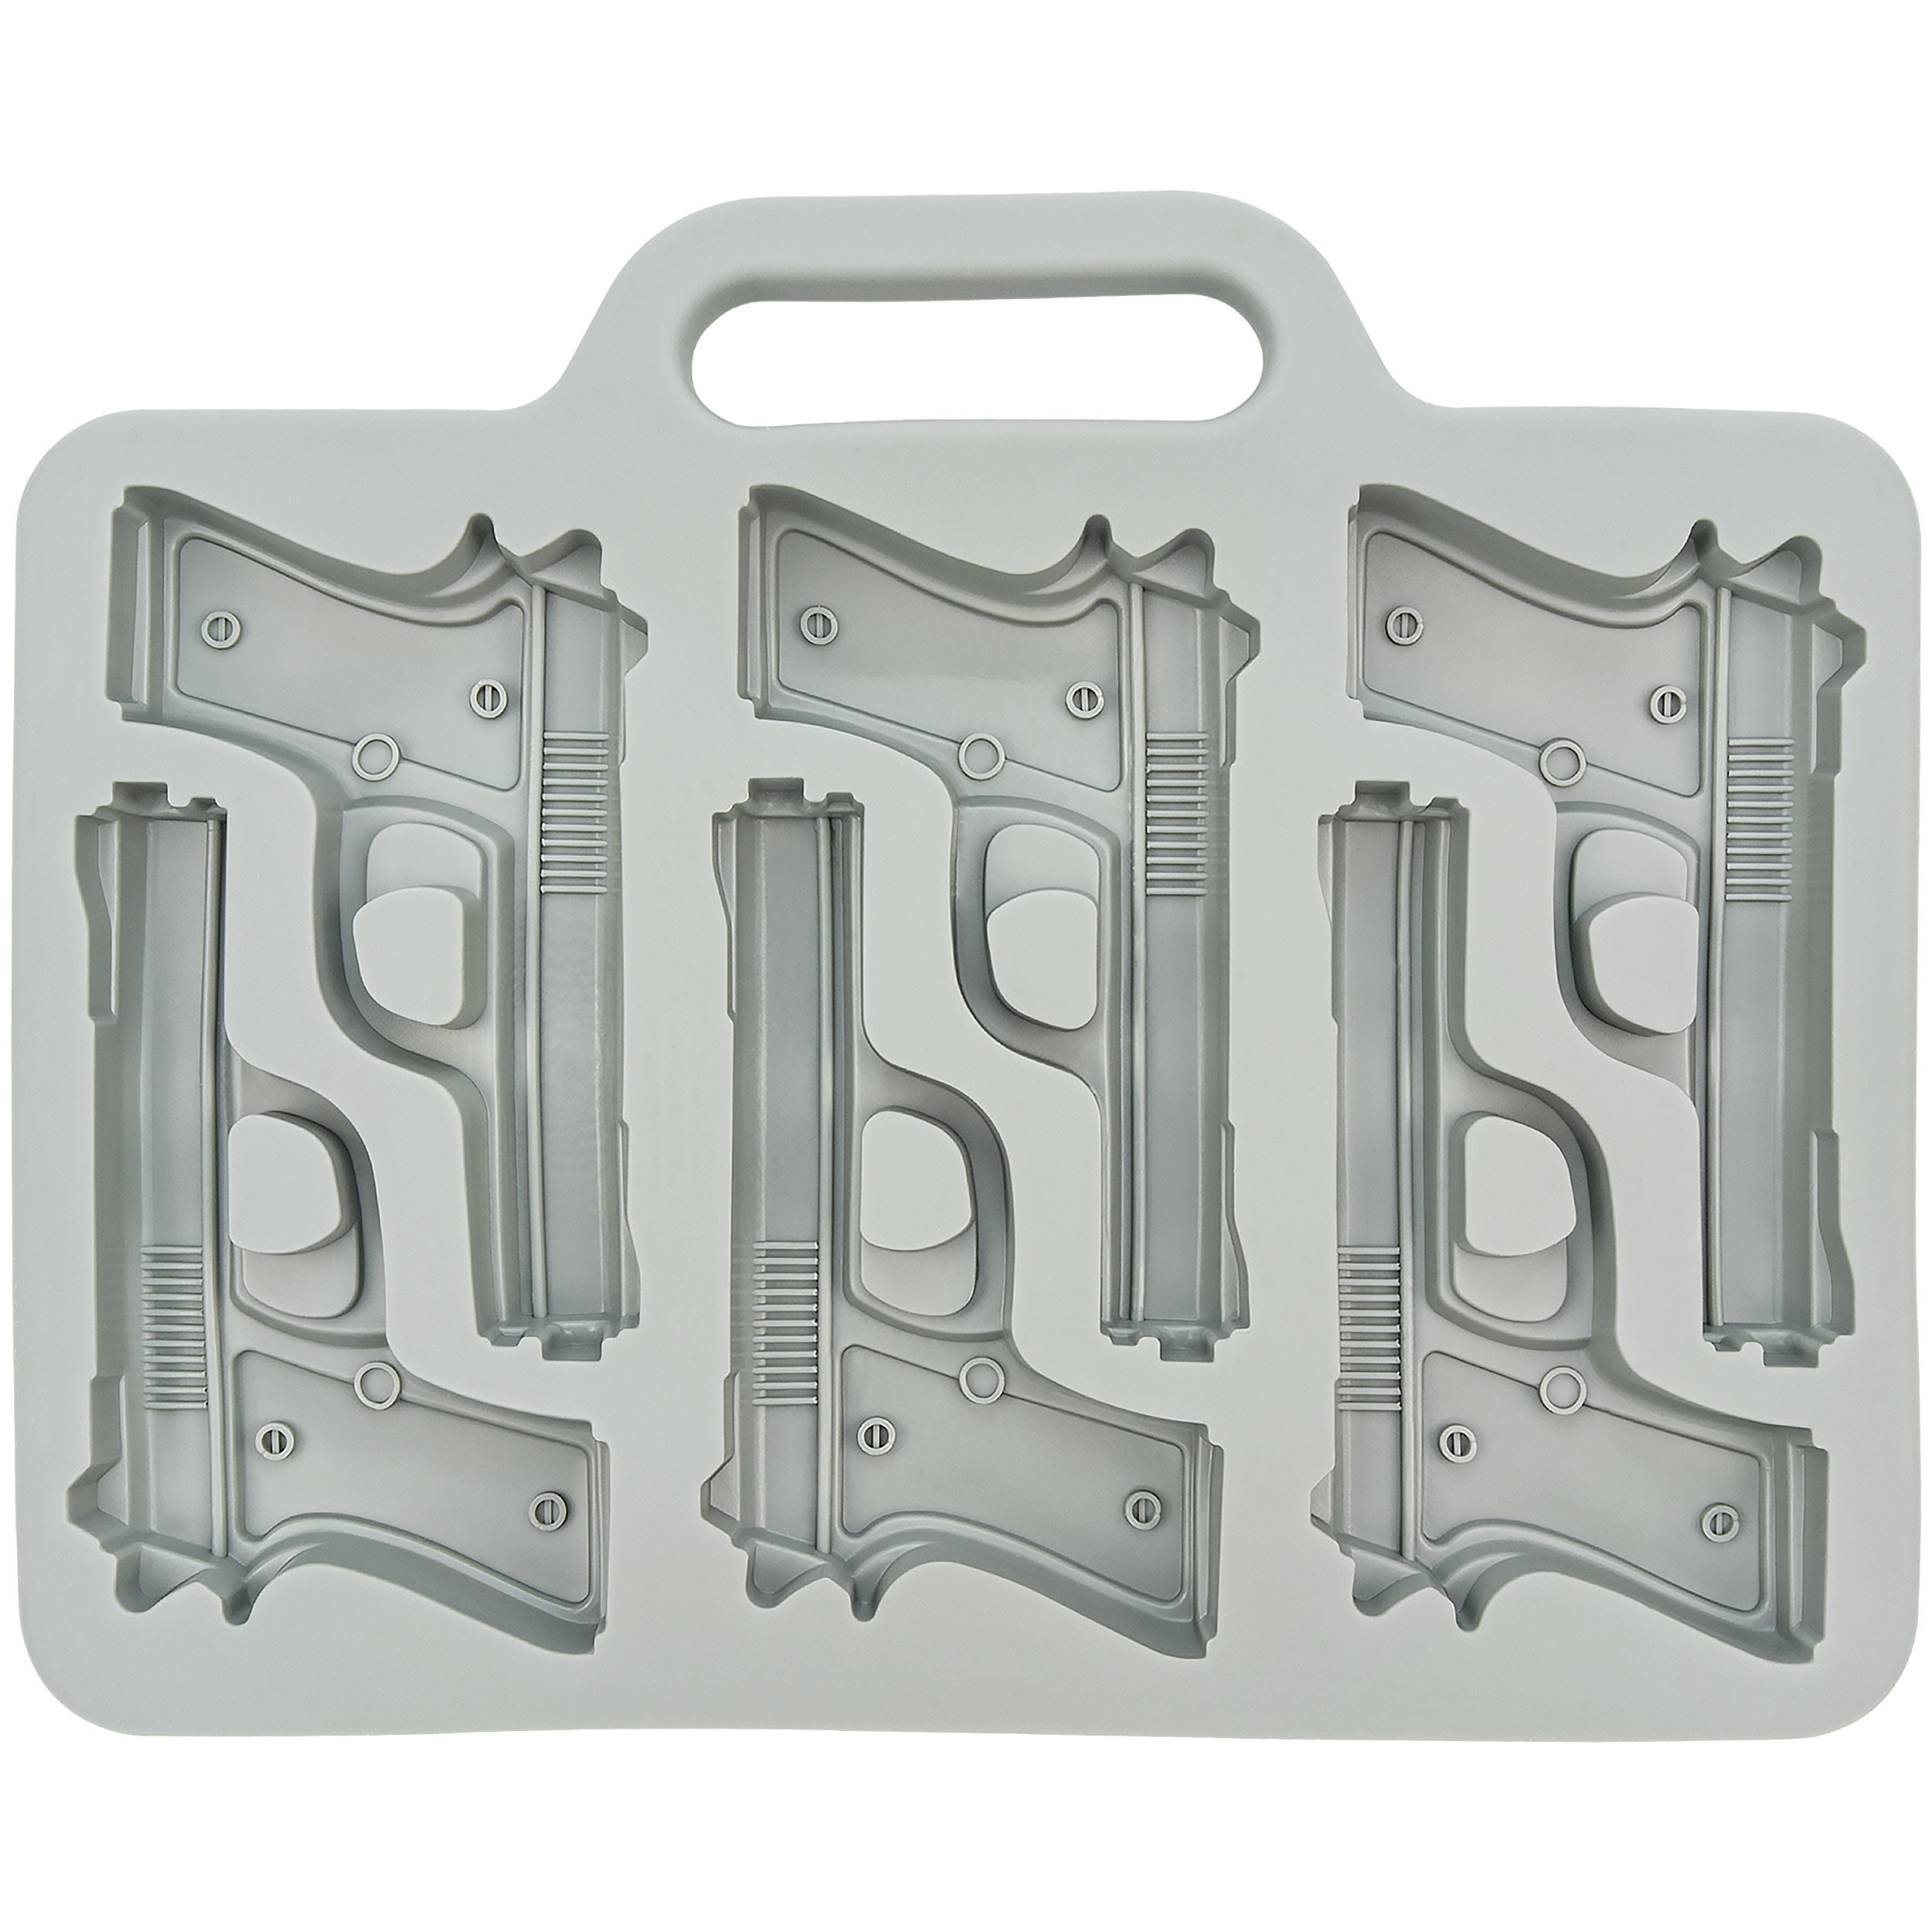 Southern Homewares Stick 'Em Up! Gun Ice Cube Tray